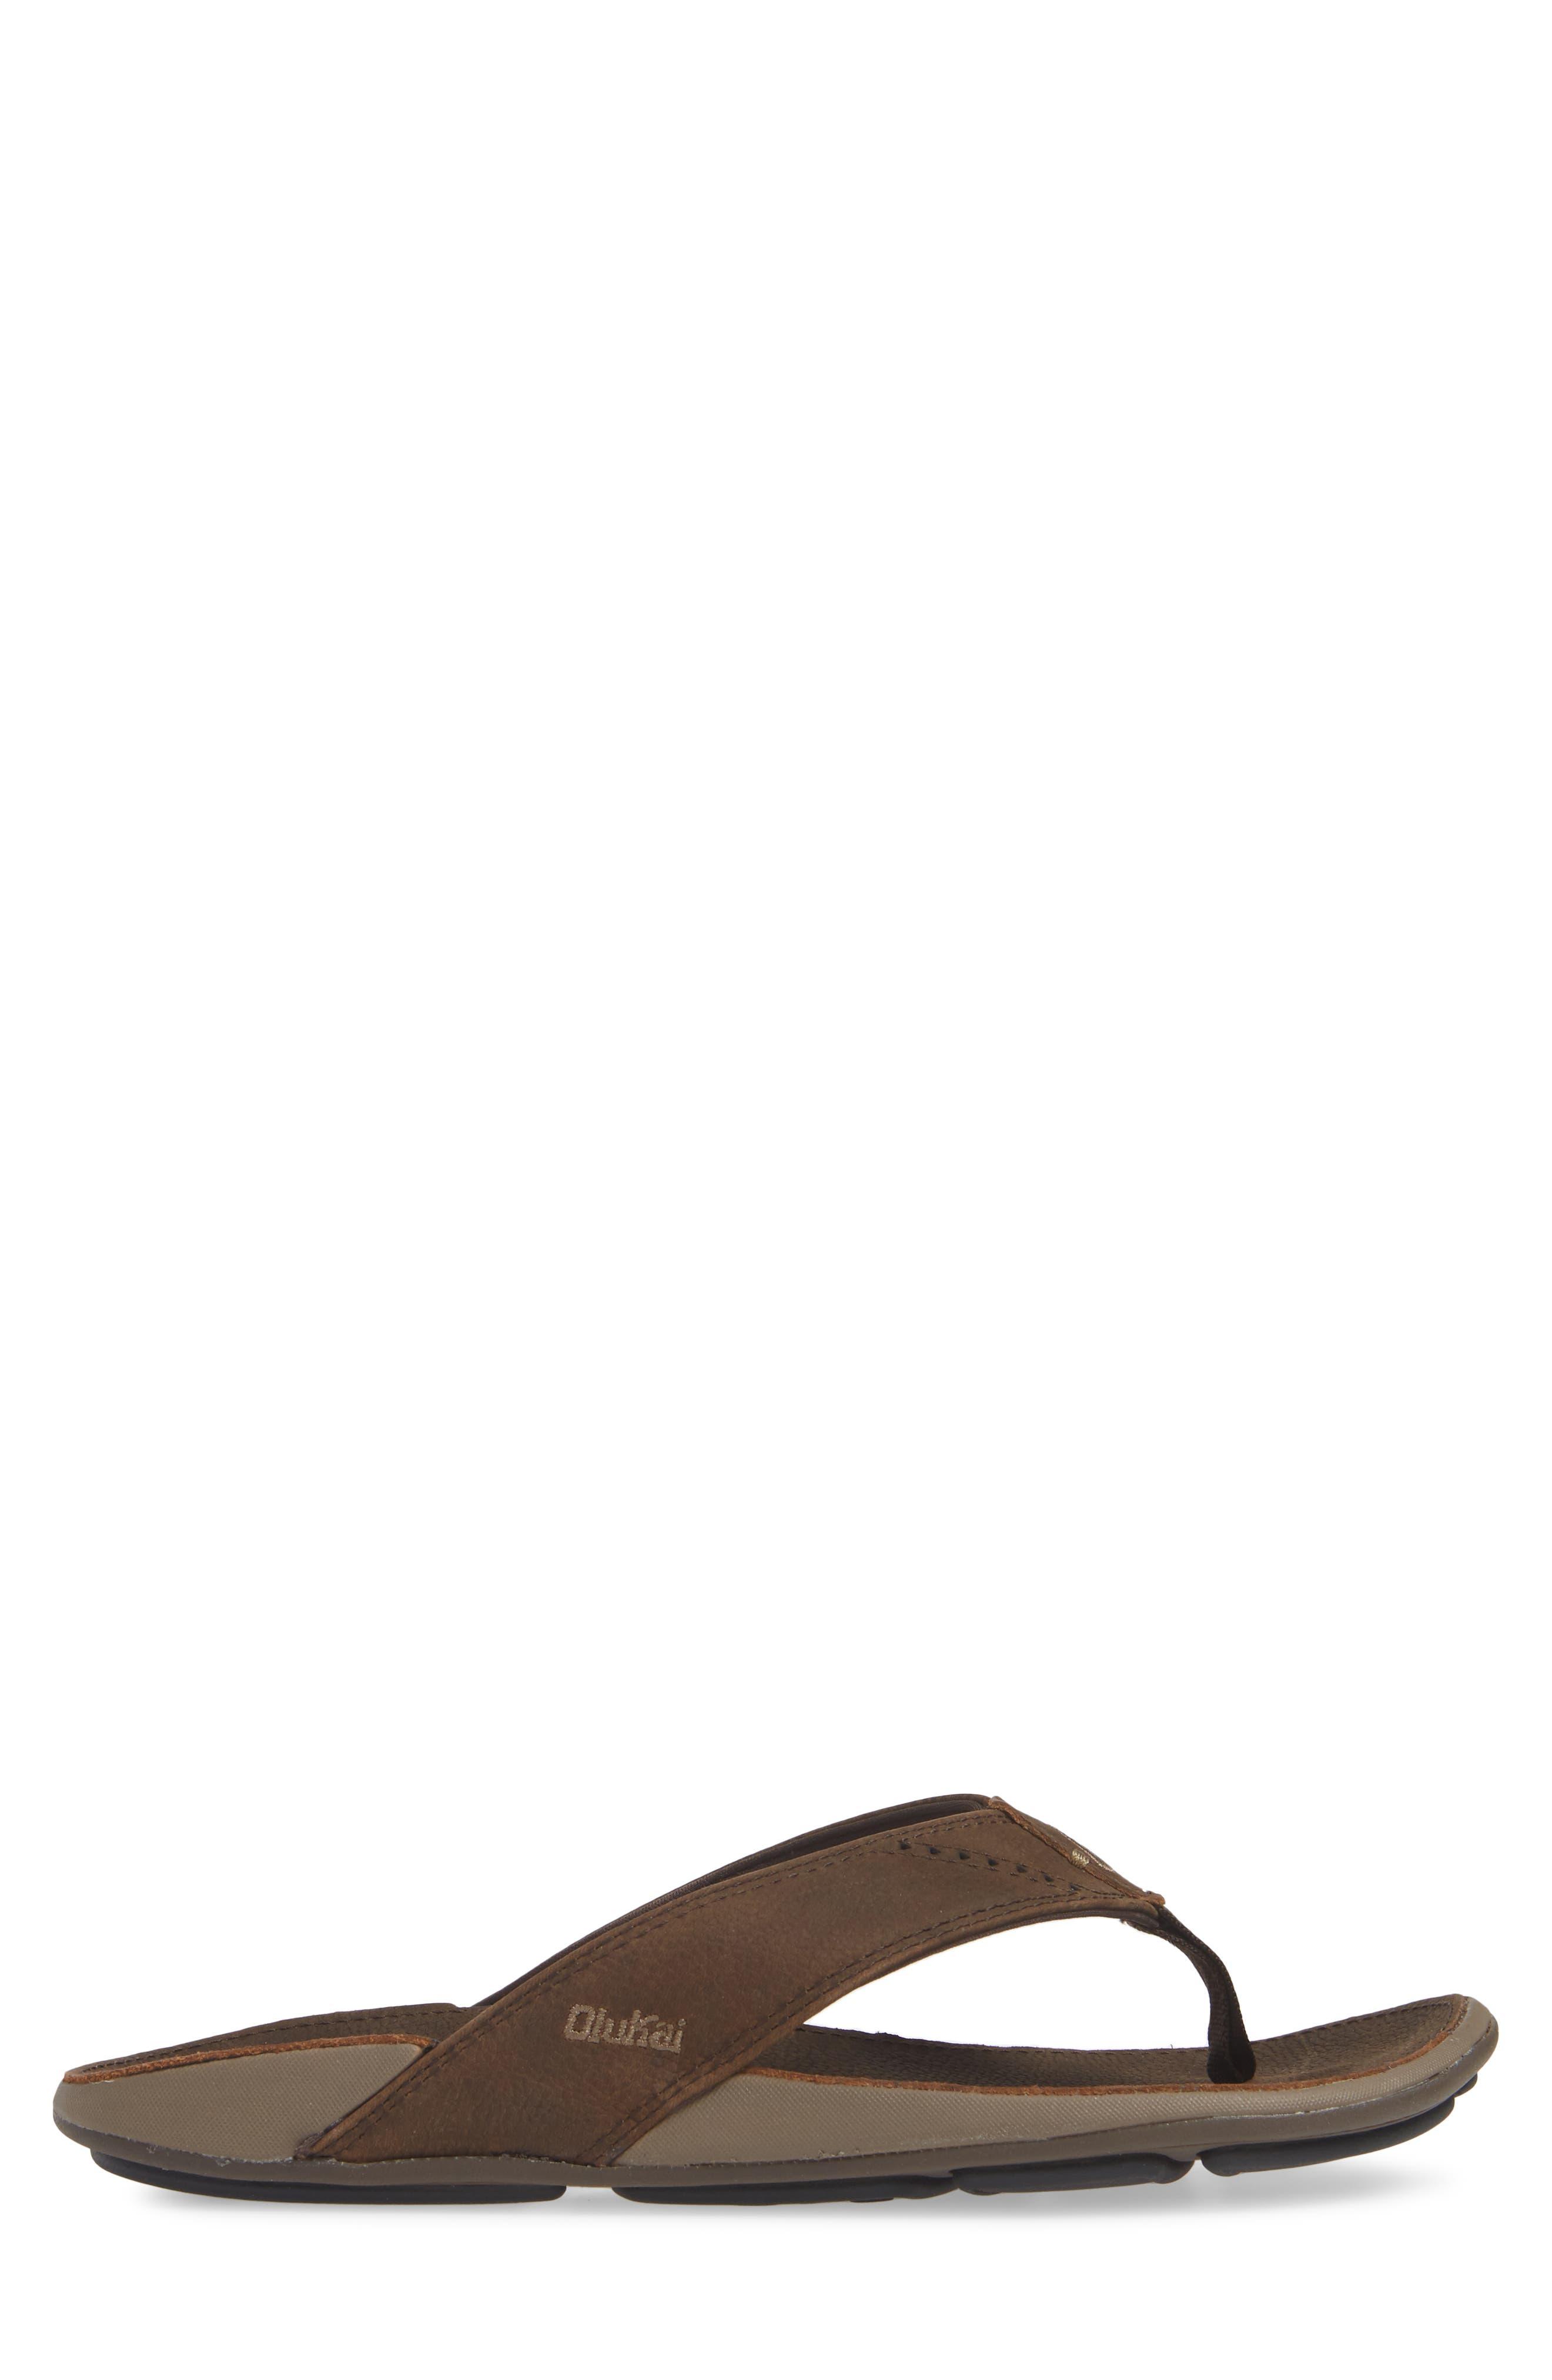 'Nui' Leather Flip Flop,                             Alternate thumbnail 3, color,                             ESPRESSO LEATHER